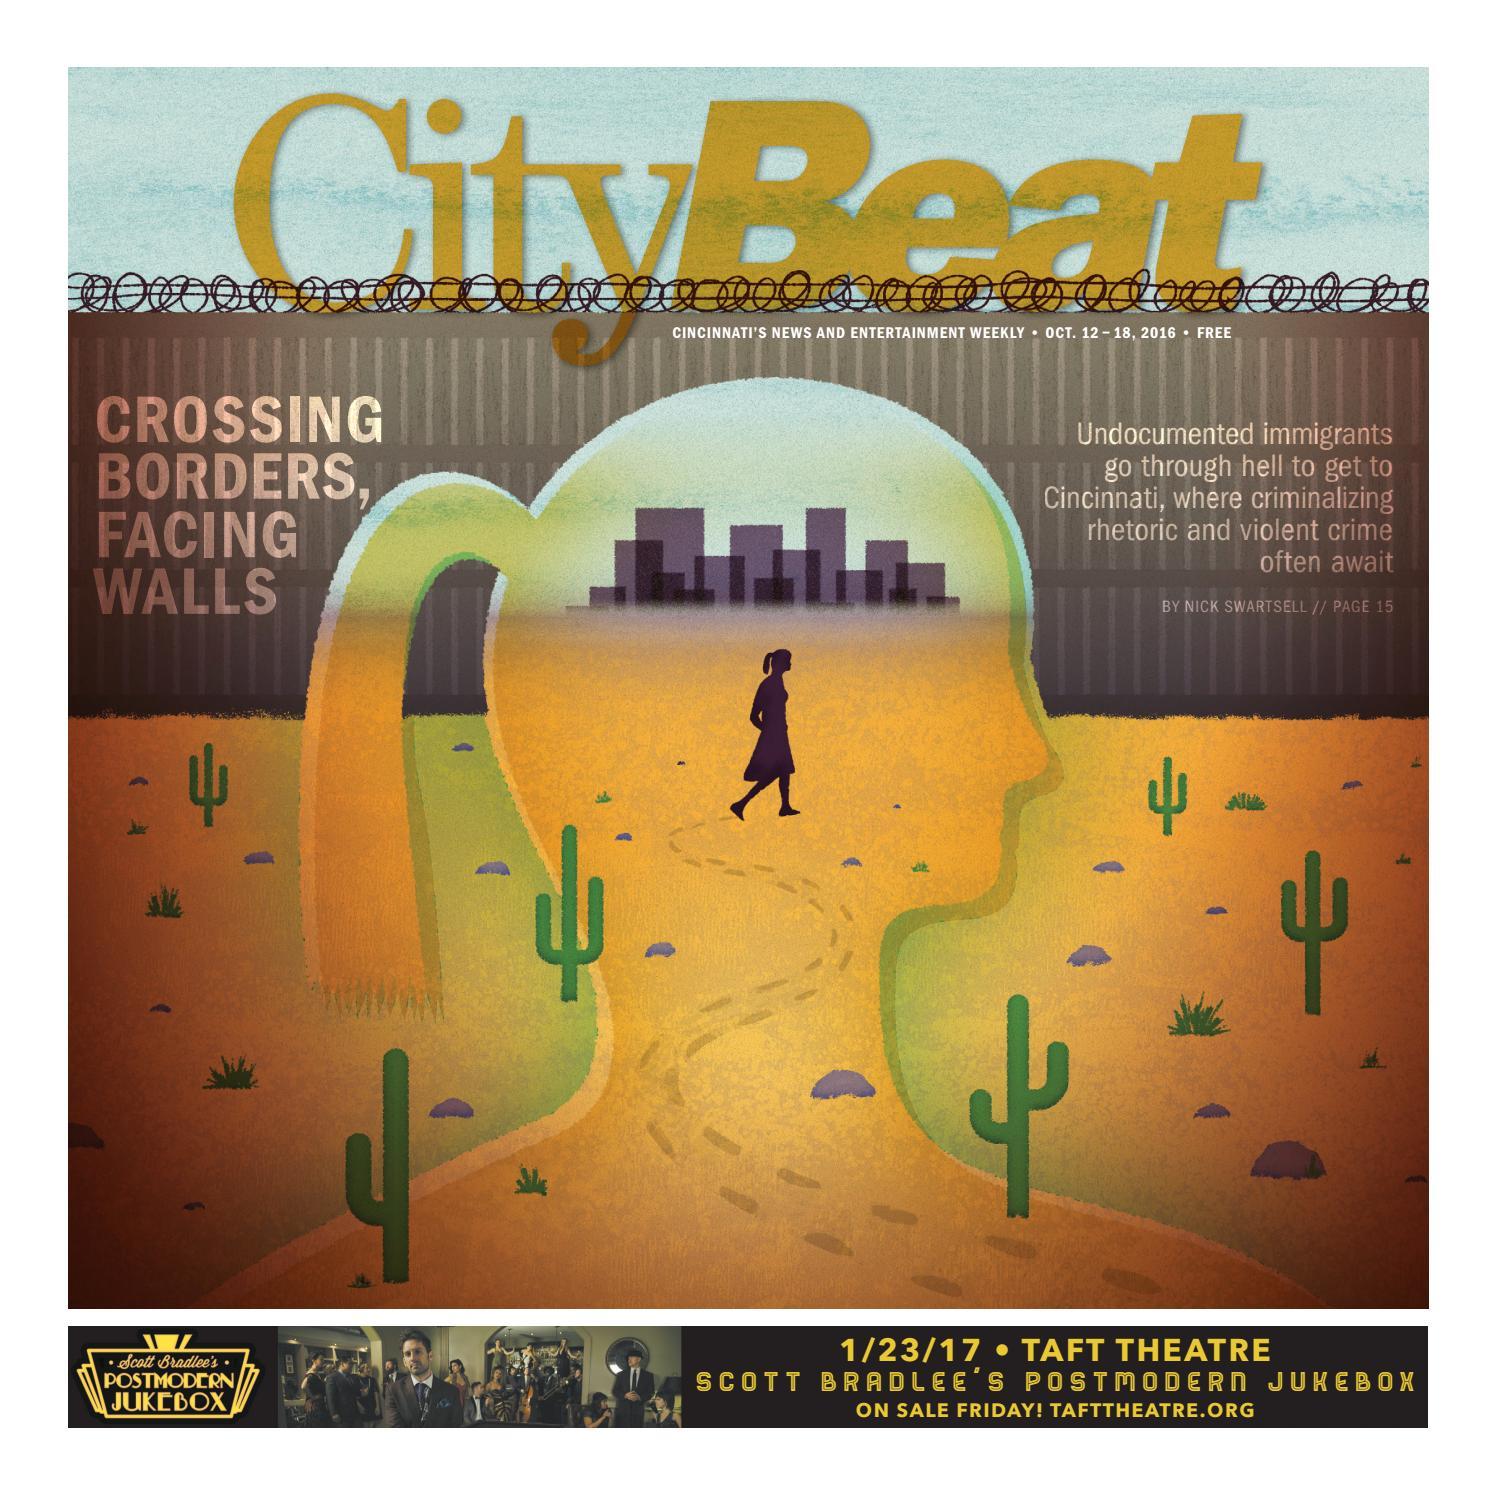 Citybeat Oct 12 2016 By Cincinnati Citybeat Issuu